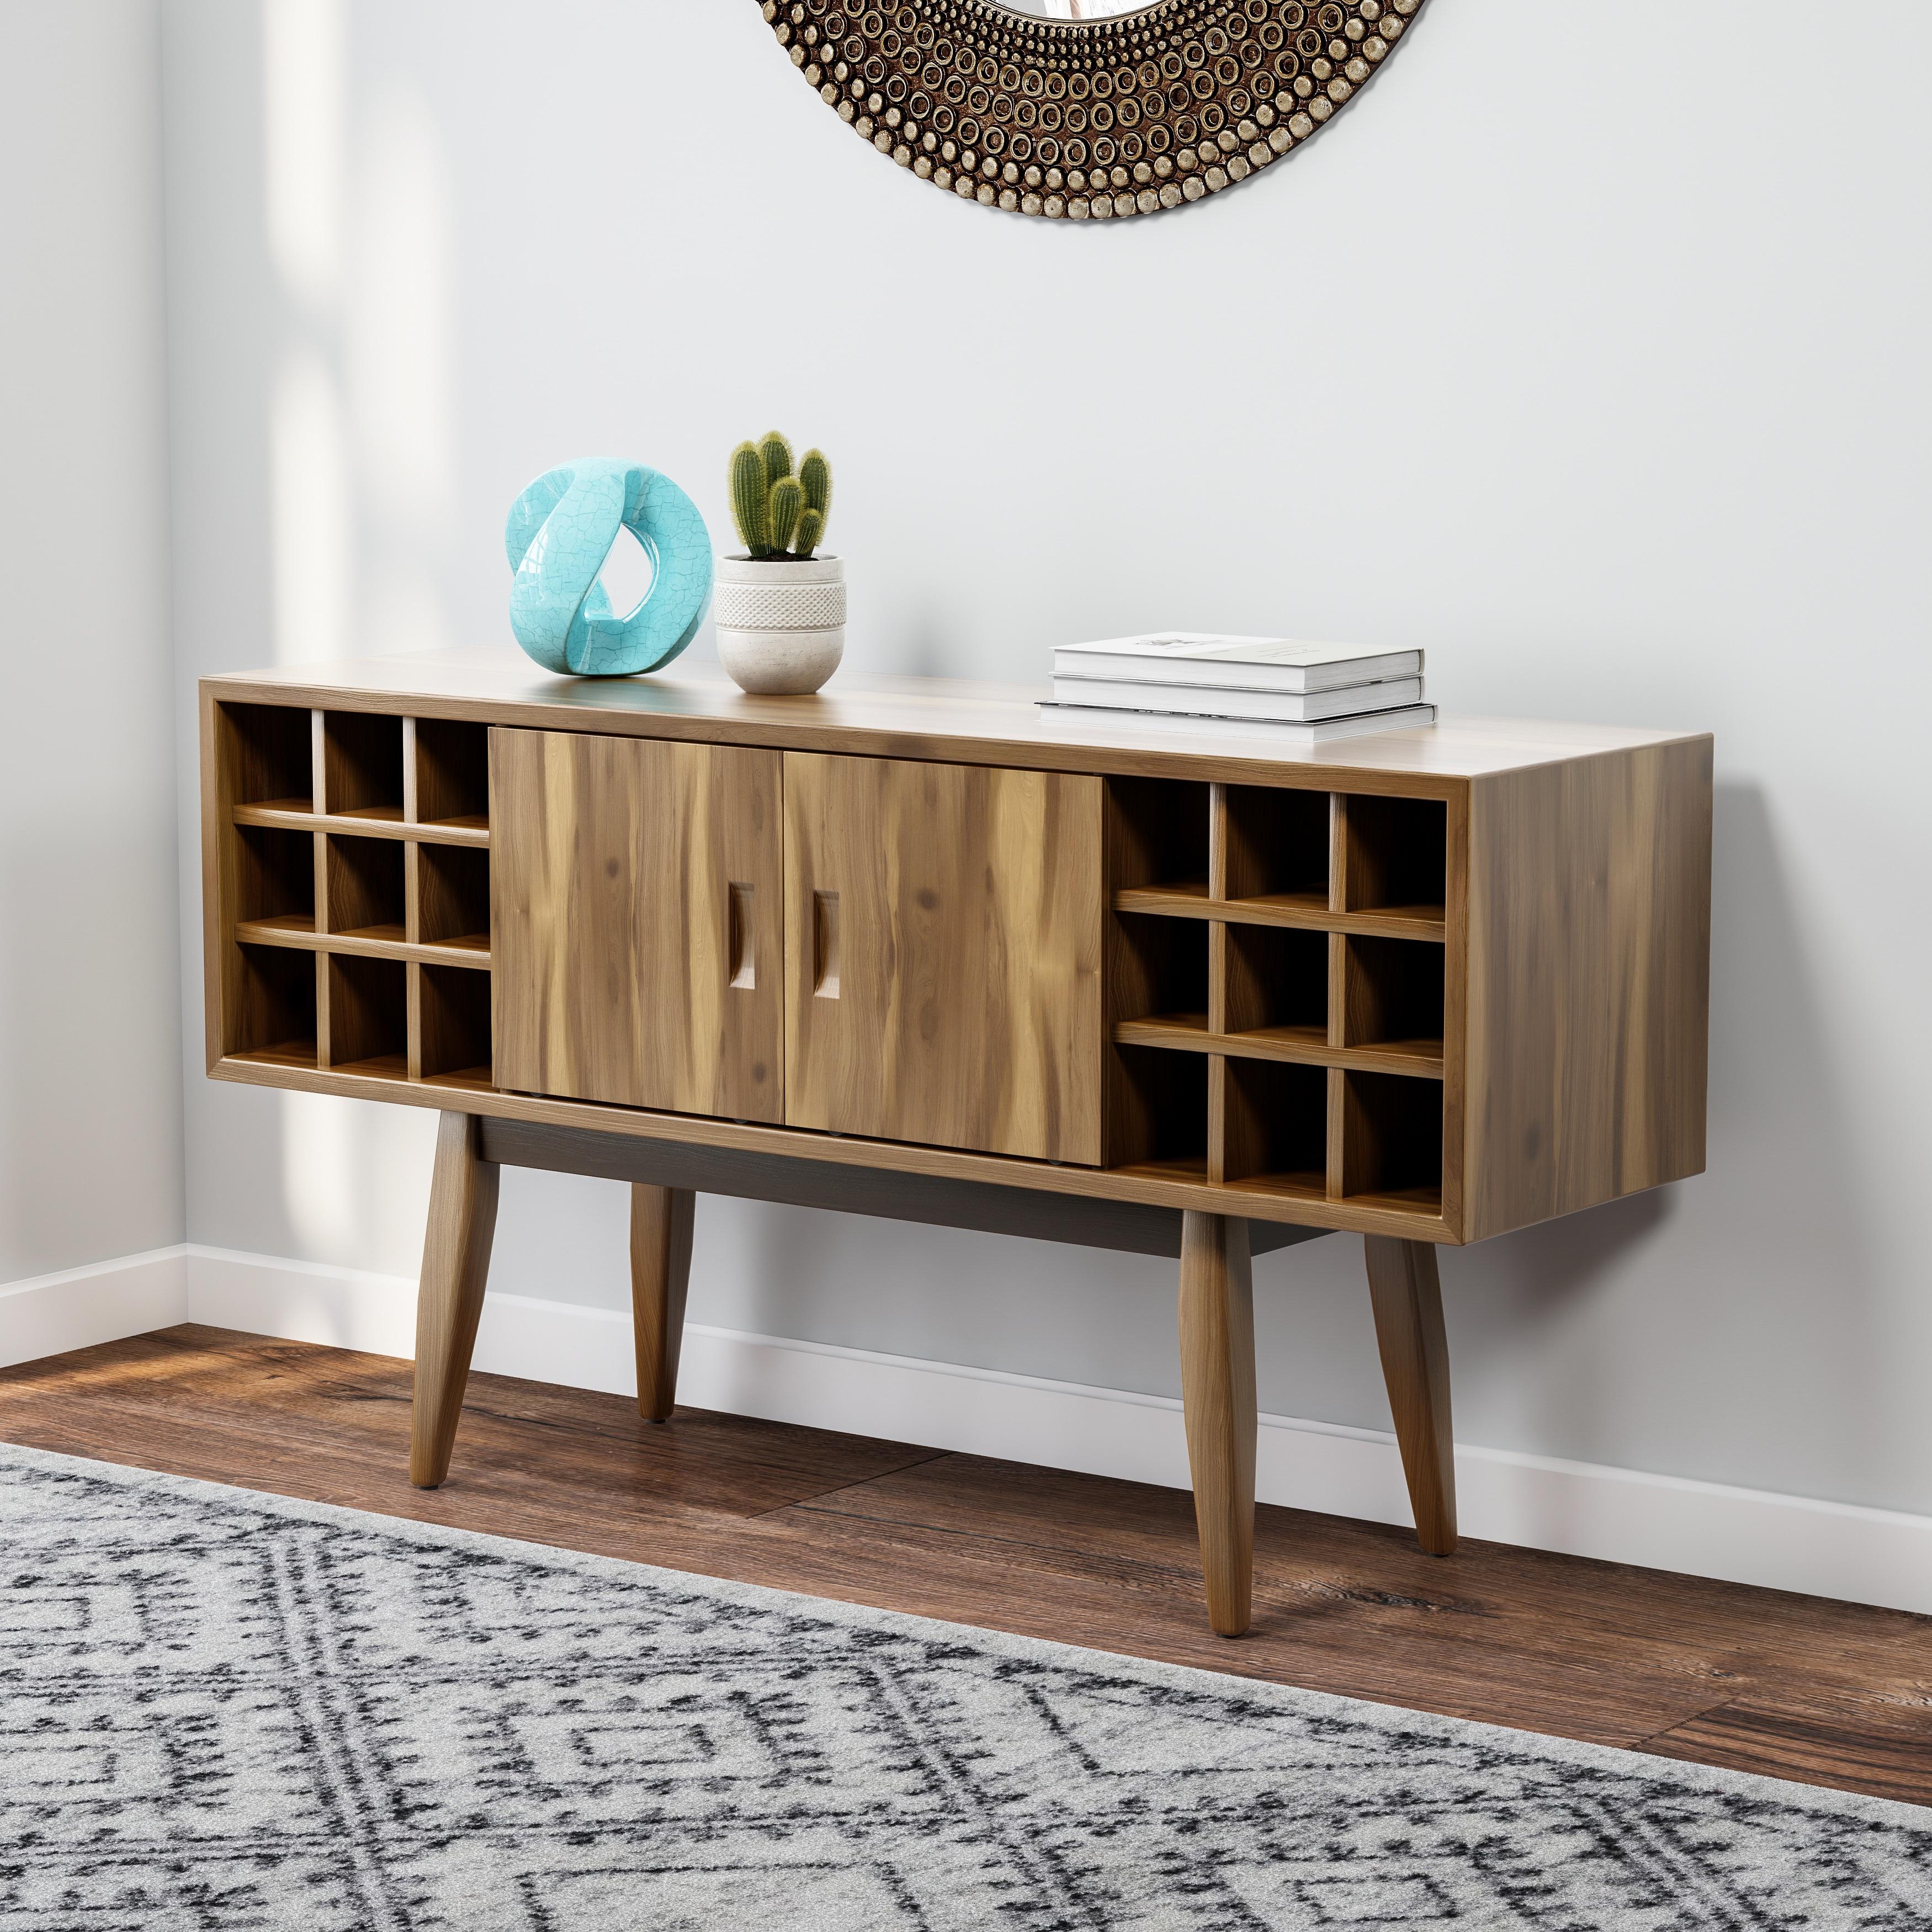 Carson carrington lund acacia wood mid century bar cabinet